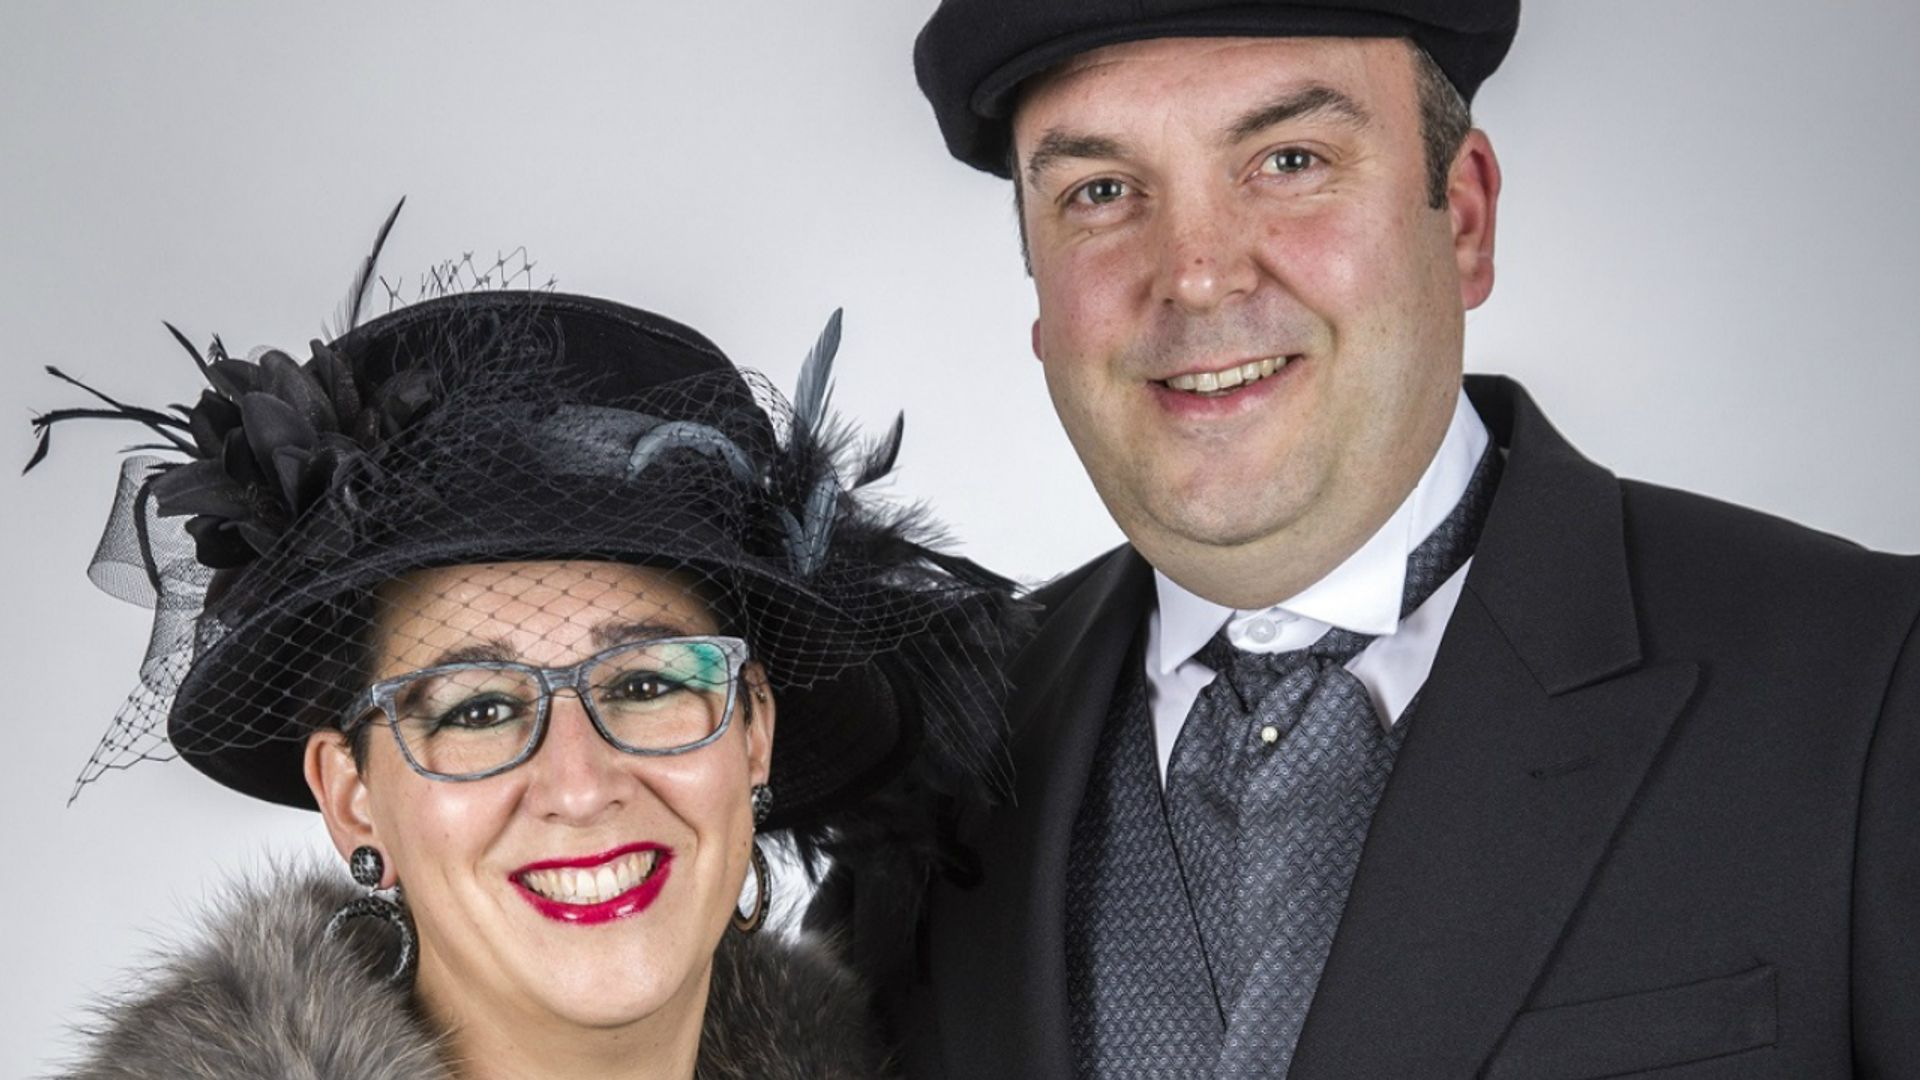 boerenbruidspaar CV dn Bok Swolgen - 2019-20120 (Arno en Ilse Kursten)